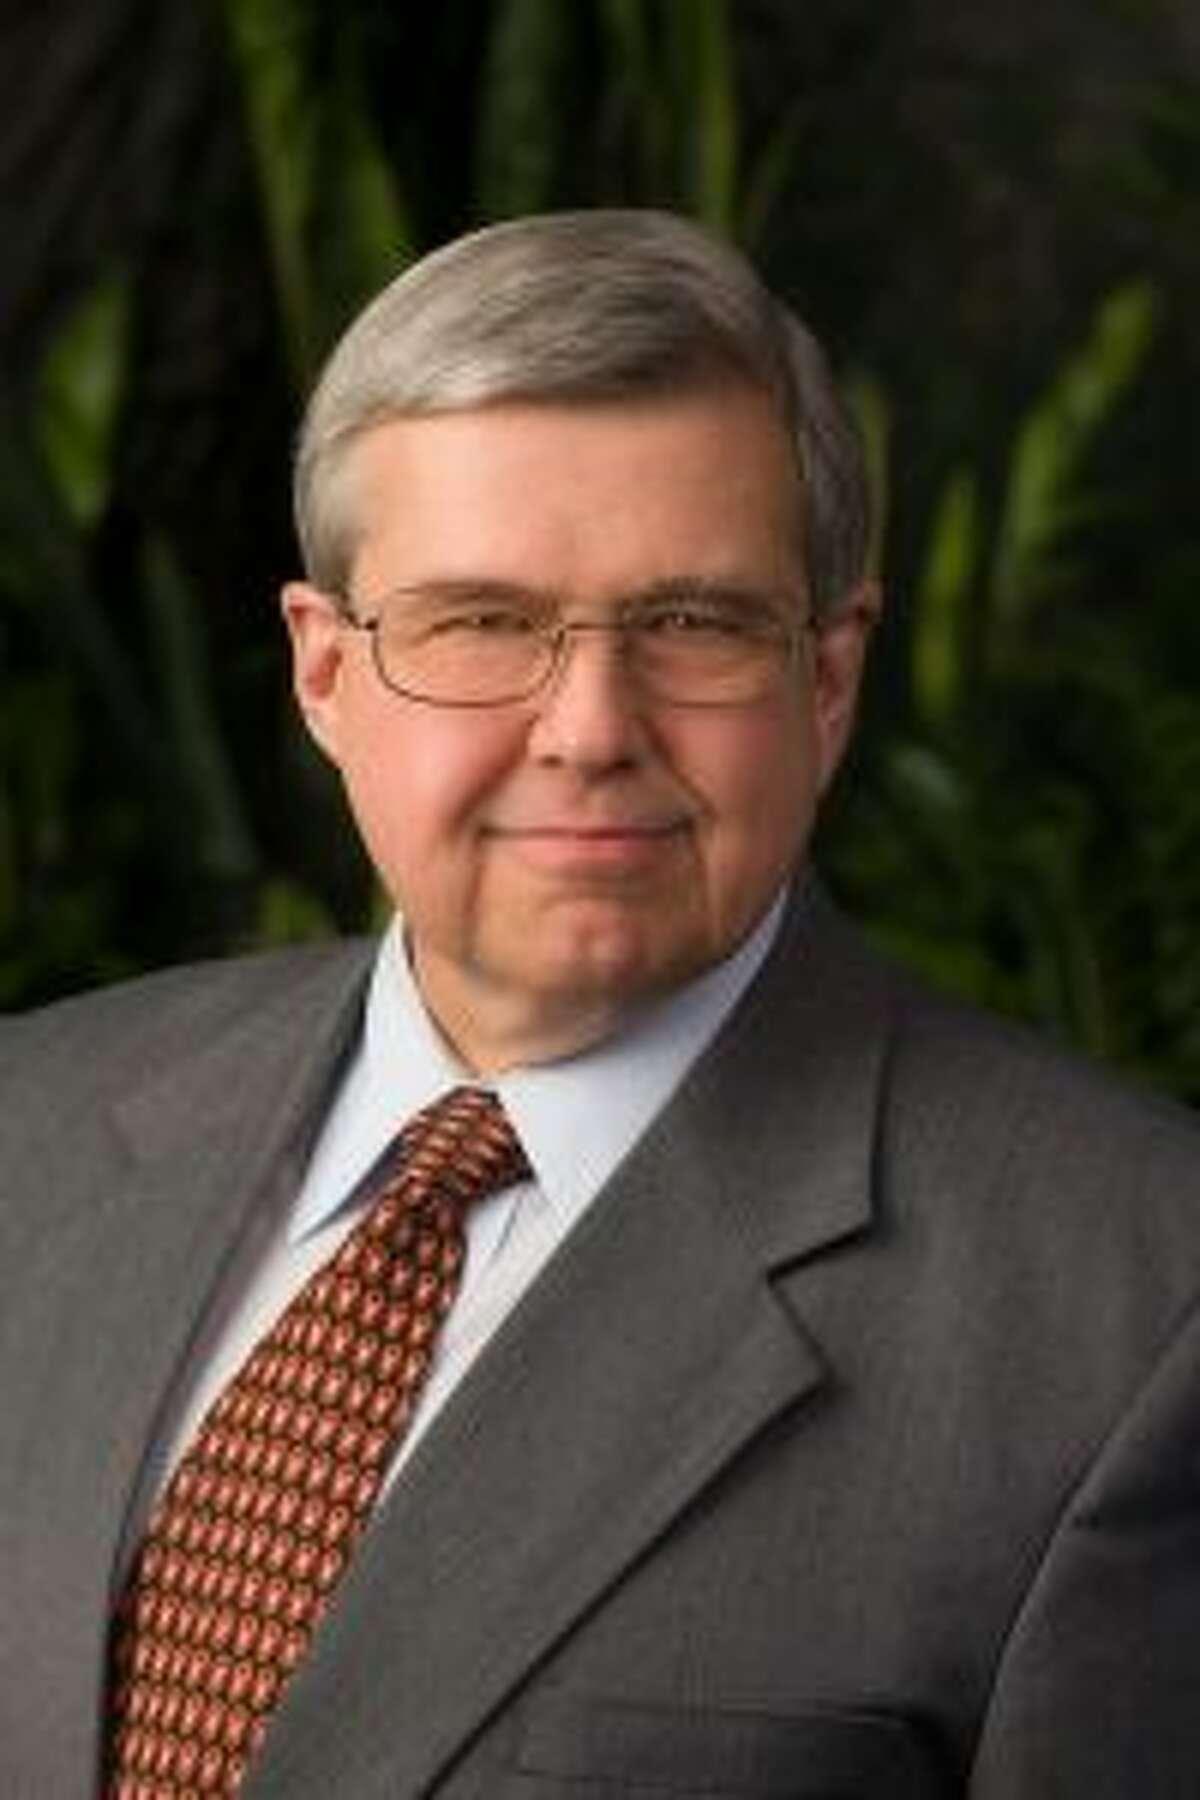 Russell N. Howes